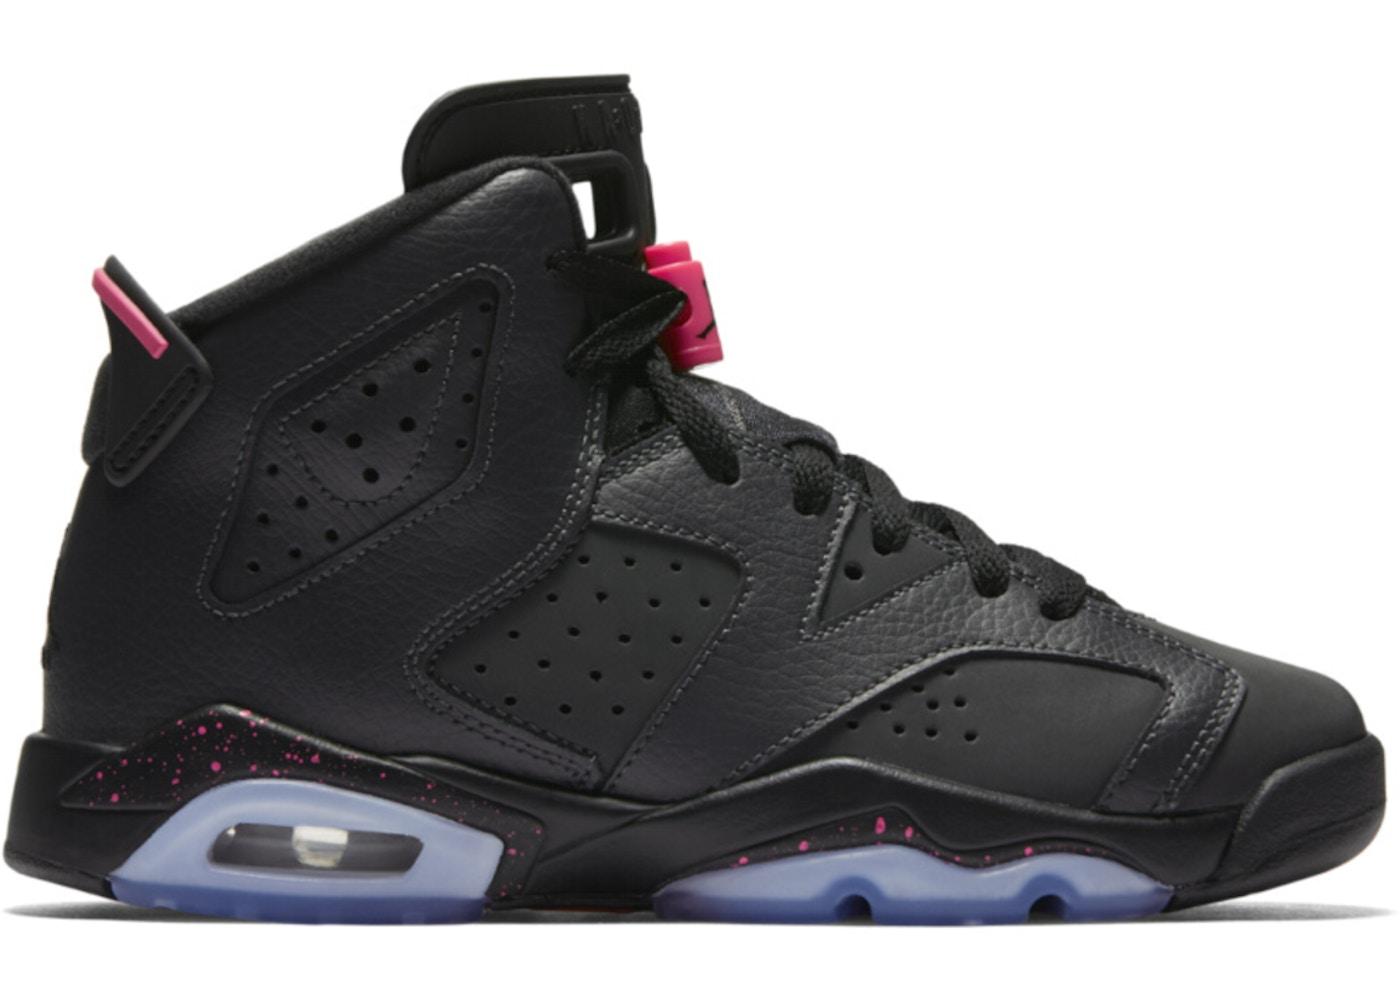 premium selection 2527e 2b27d Jordan 6 Retro Hyper Pink (GS)